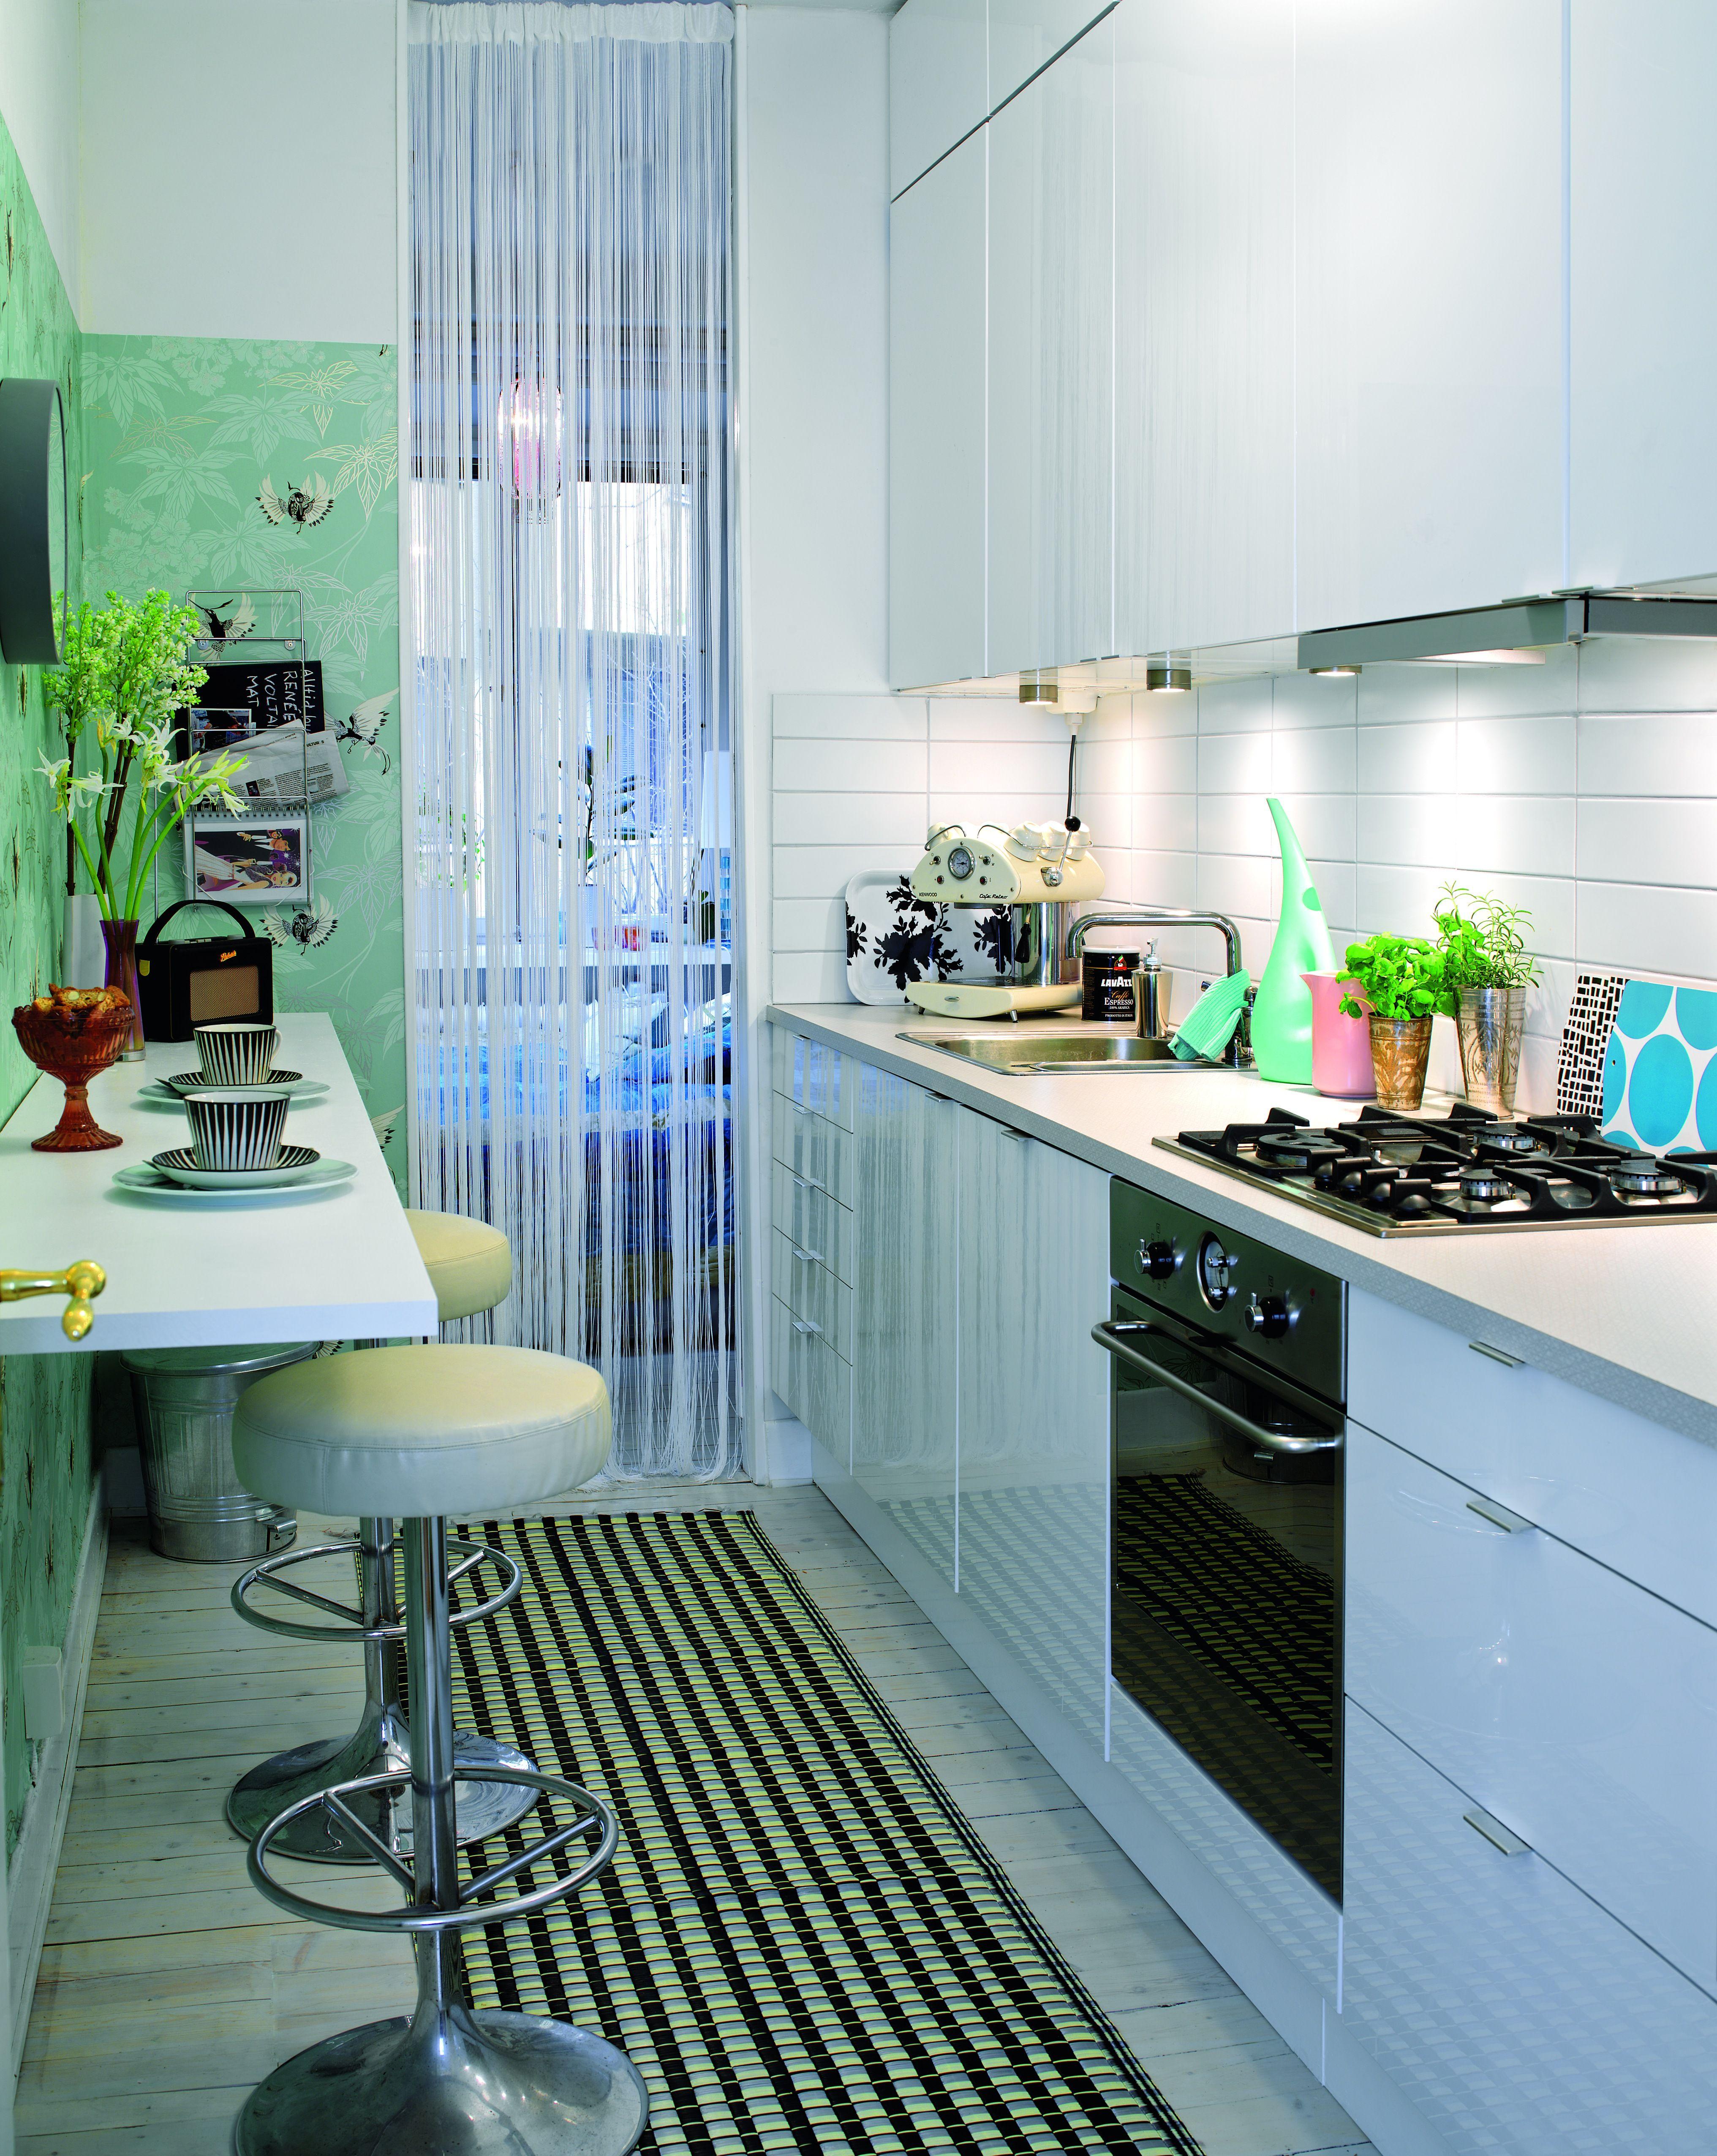 Køkkenalrum i størrelse xtra-small - Bolig Magasinet | Køkken ...